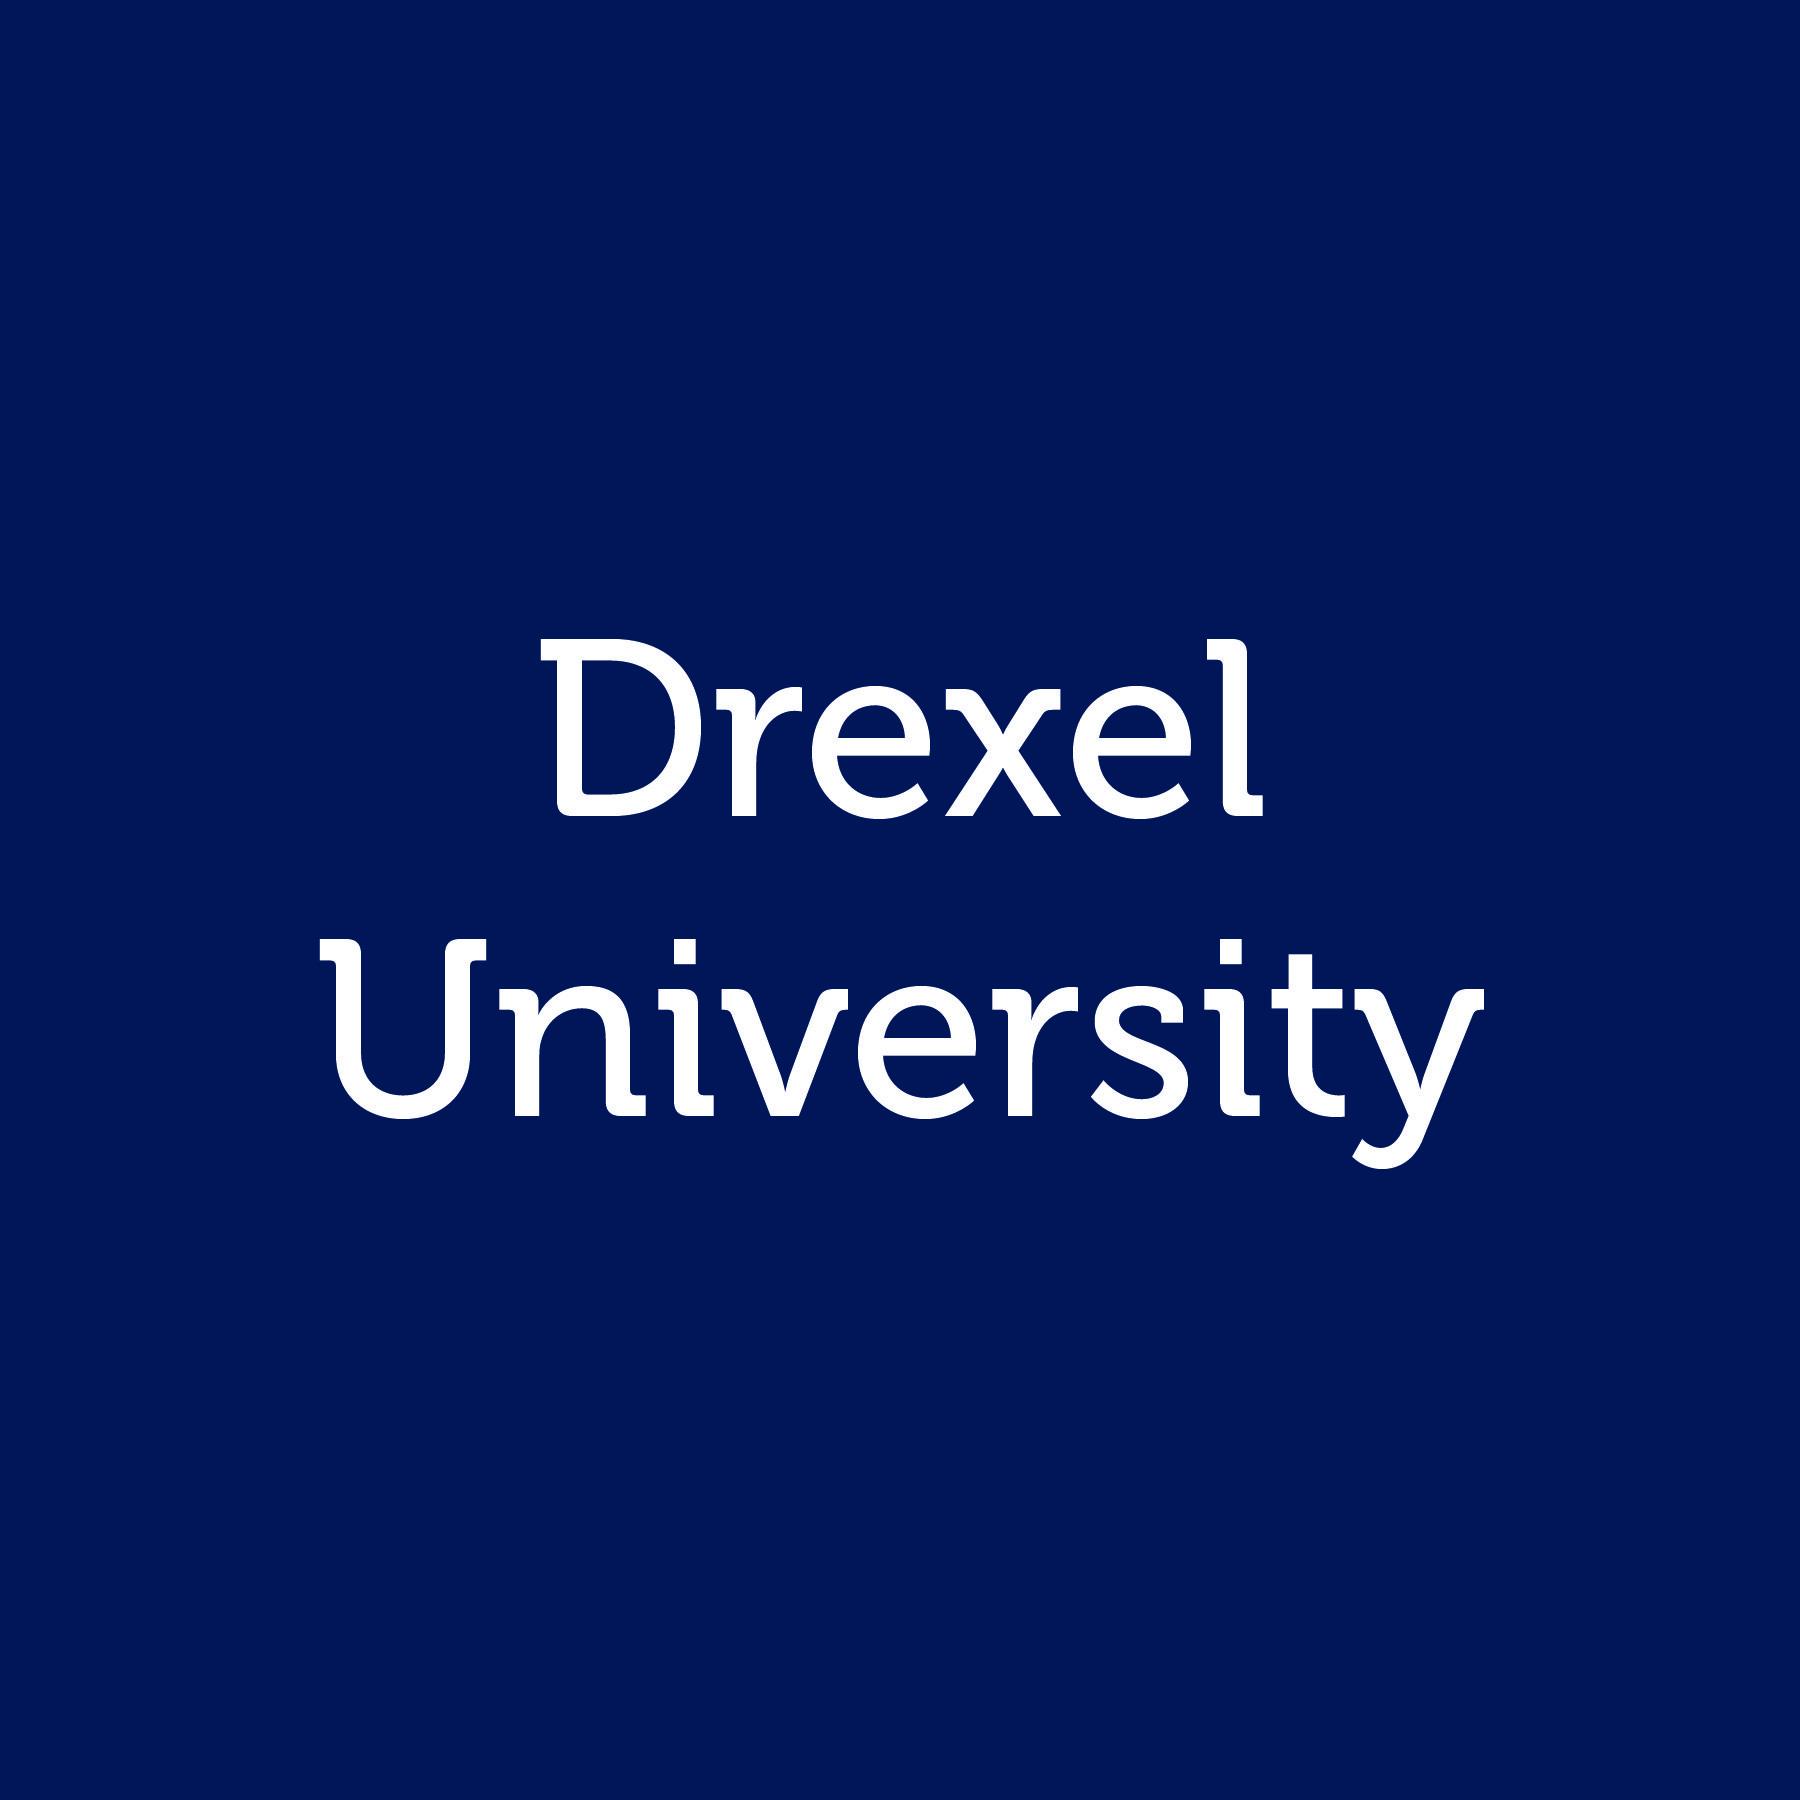 drexel university stop workplace burnout resilience building